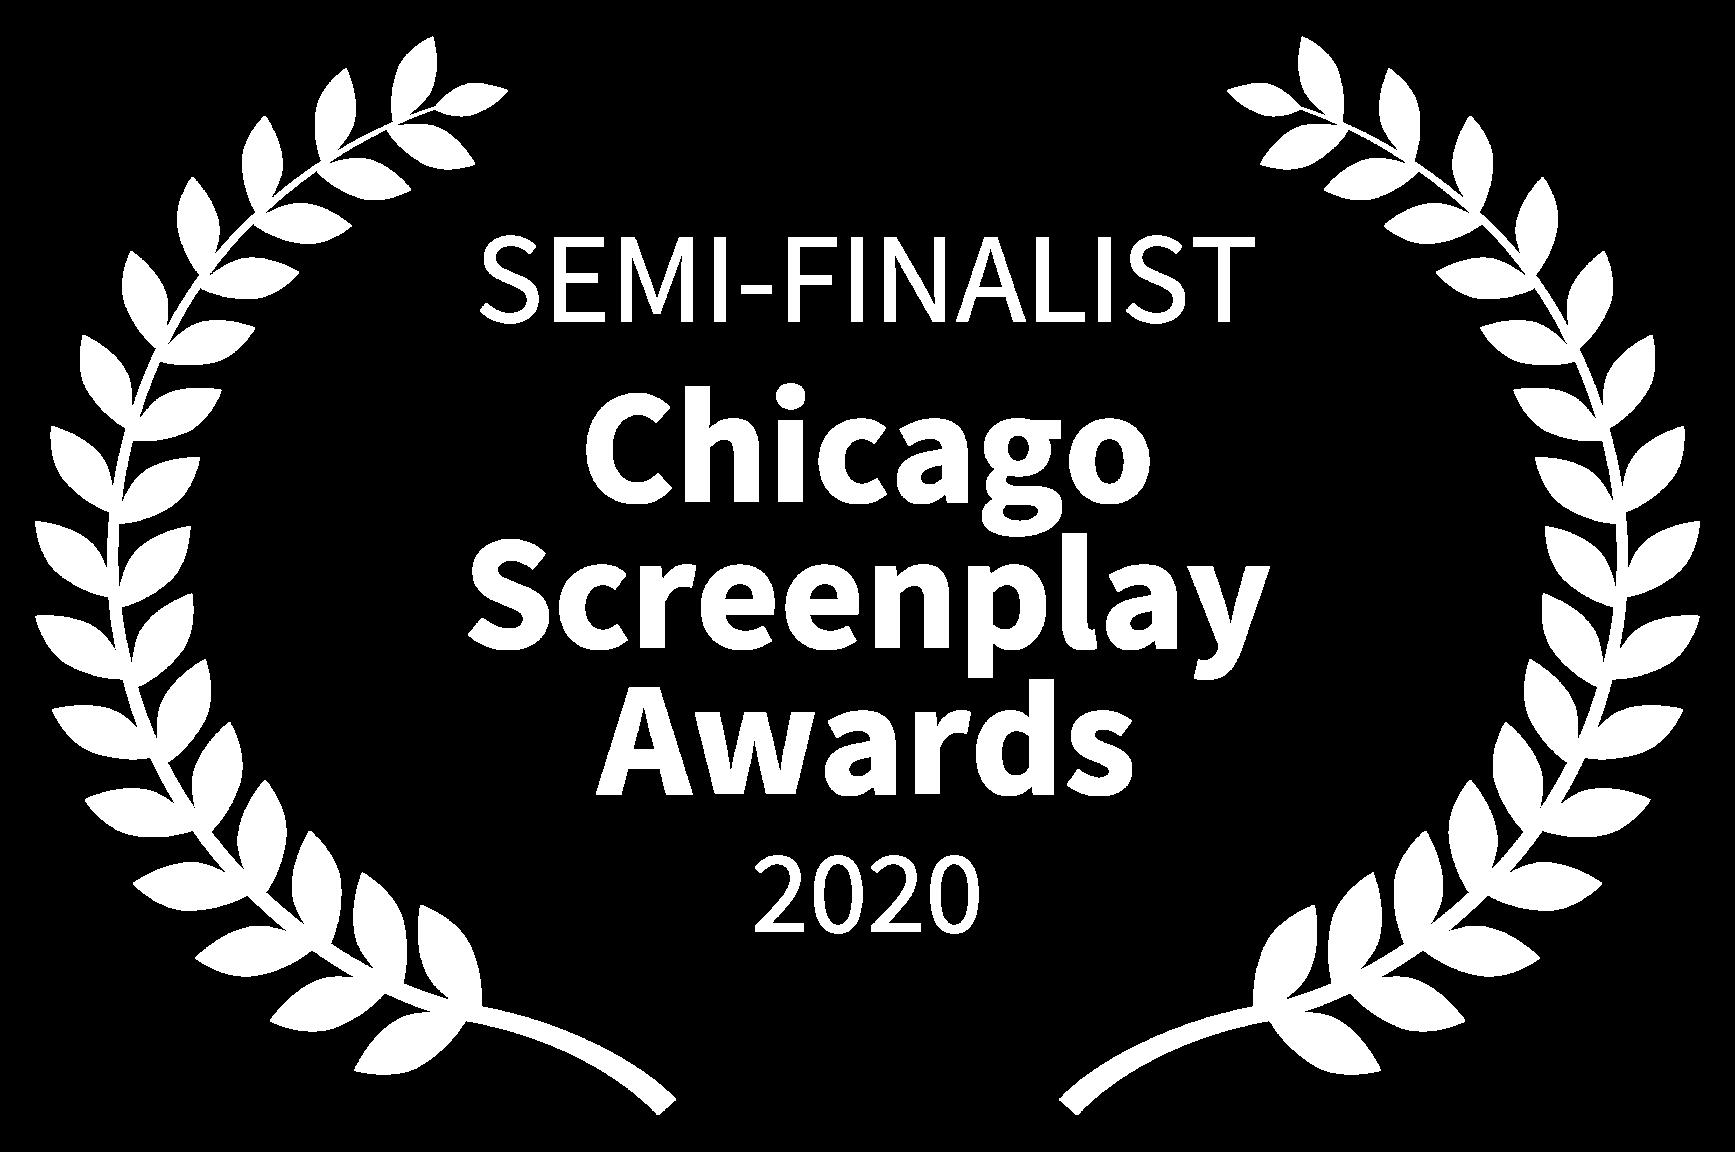 SEMI-FINALIST - Chicago Screenplay Awards - 2020